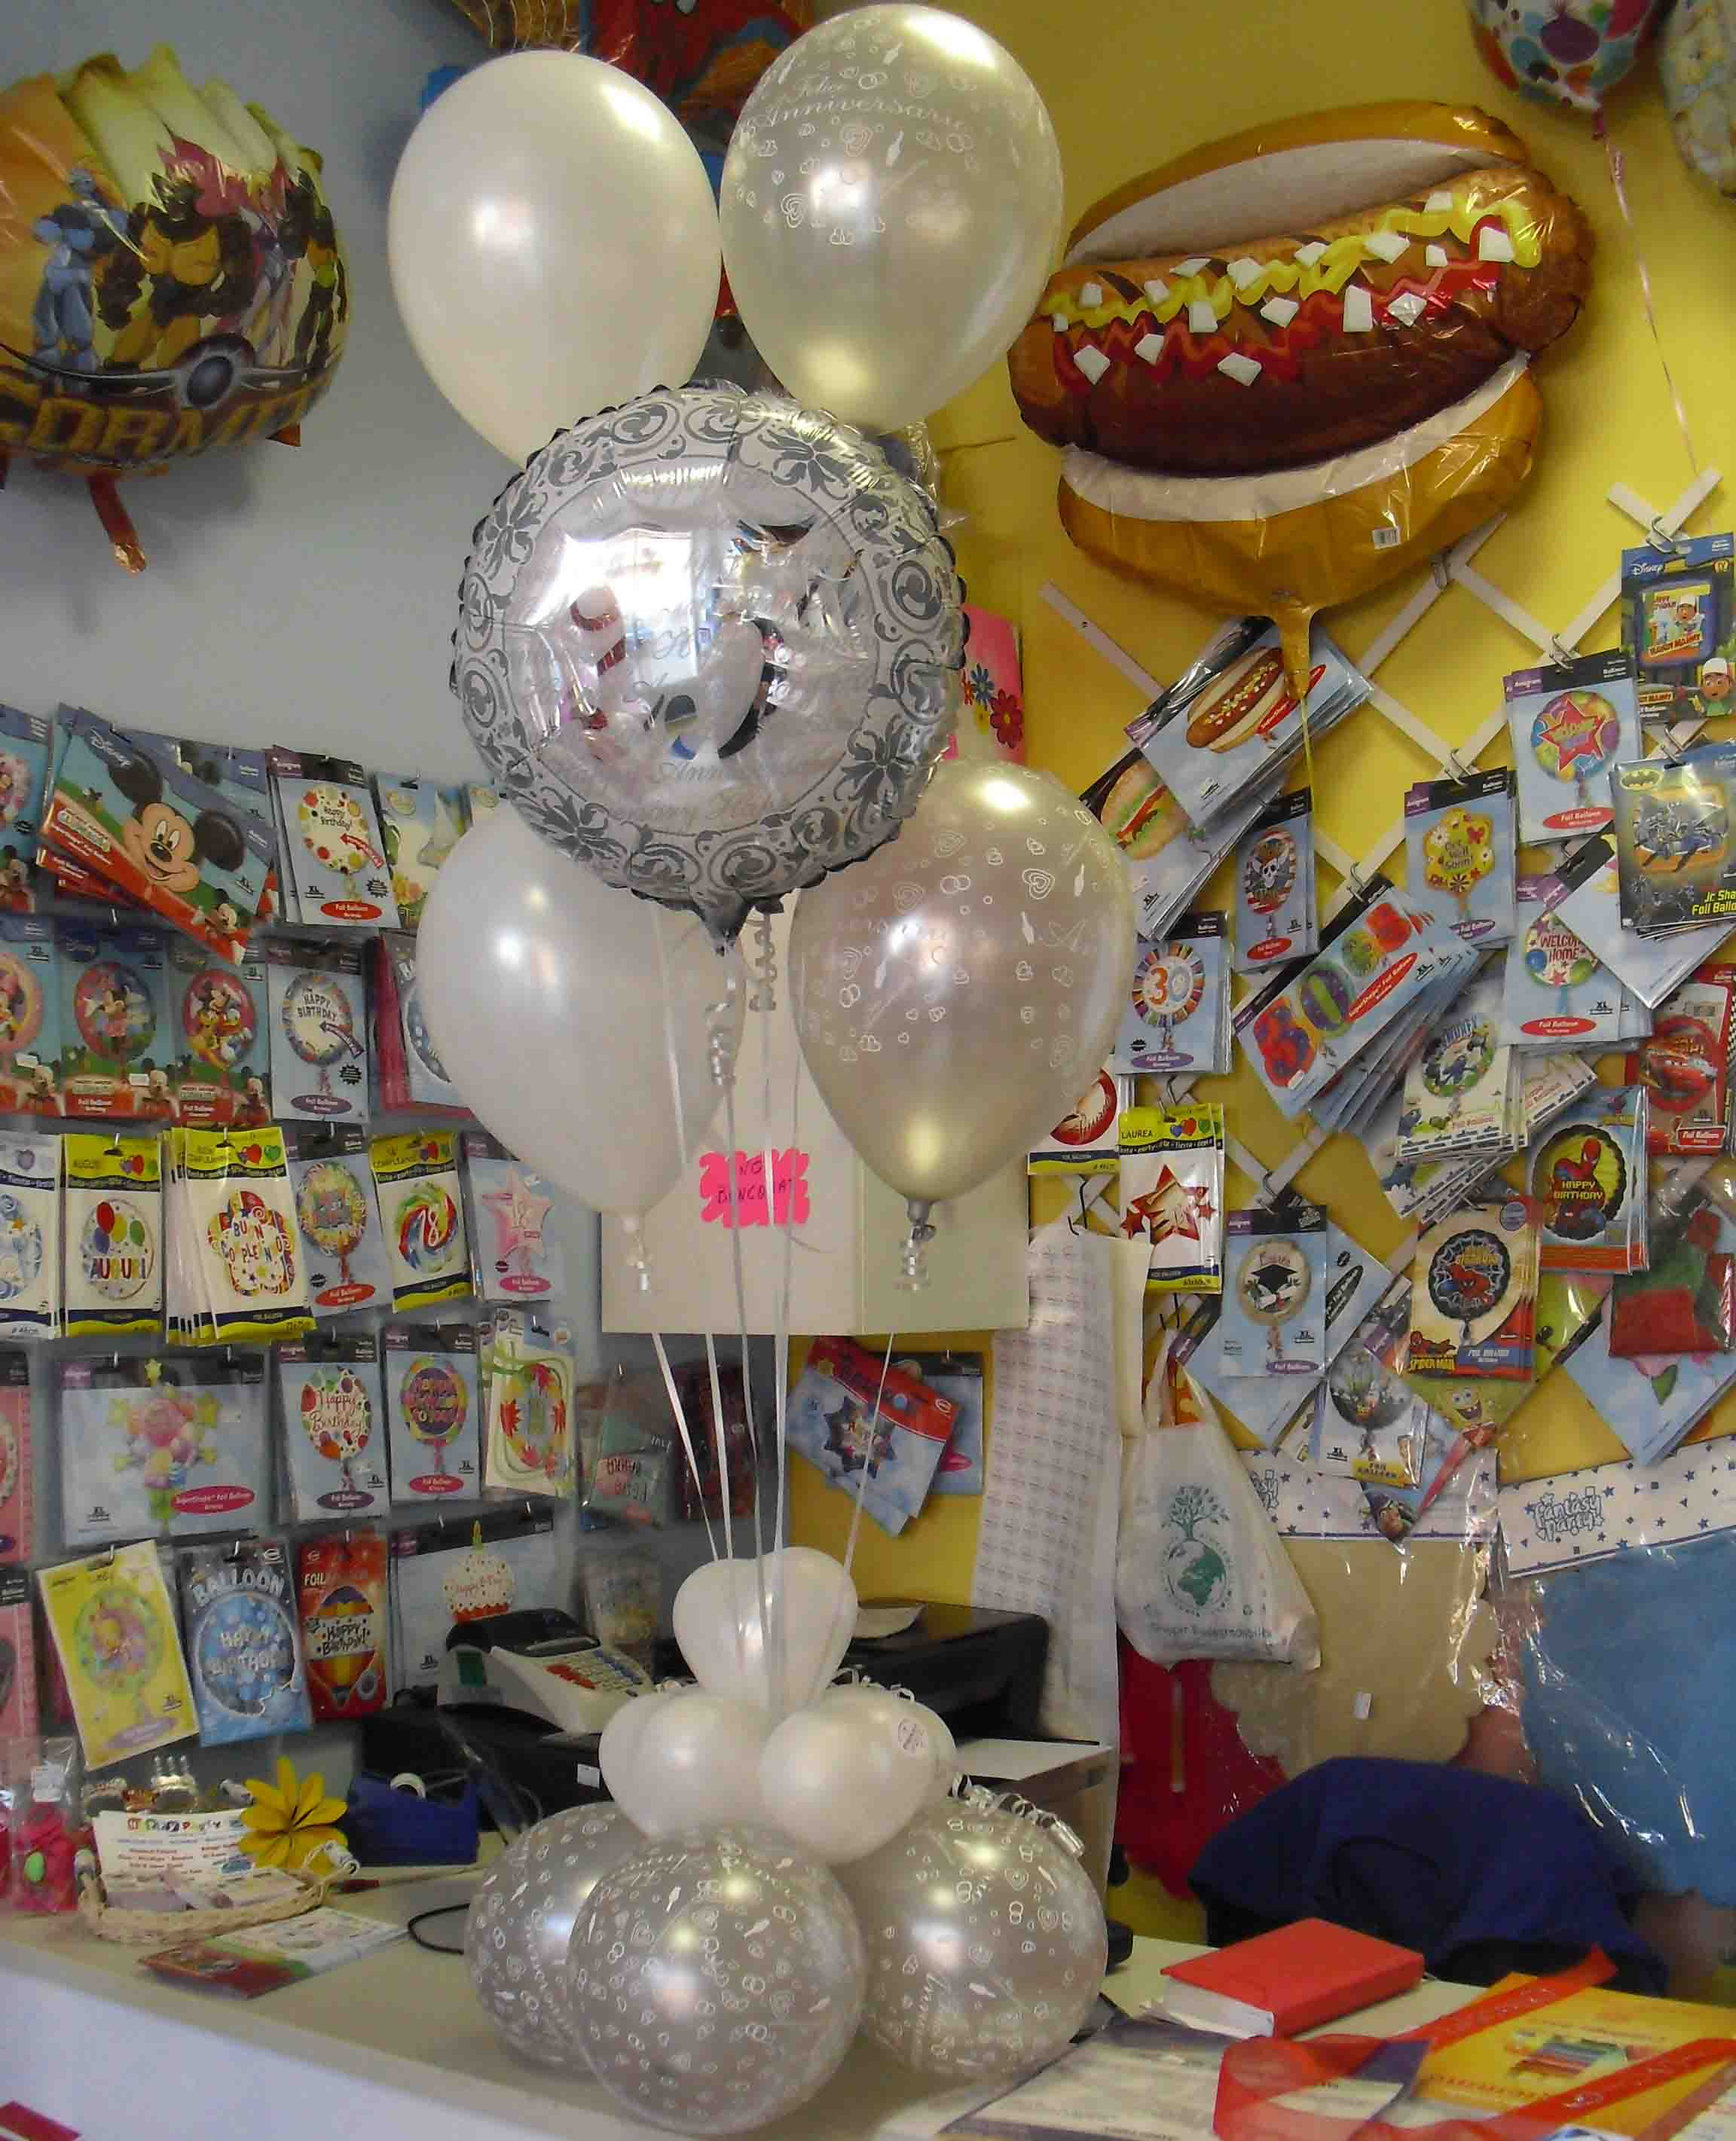 Super Allestimenti Palloncini Balloon Art Express Festoni per Matrimoni  CI28